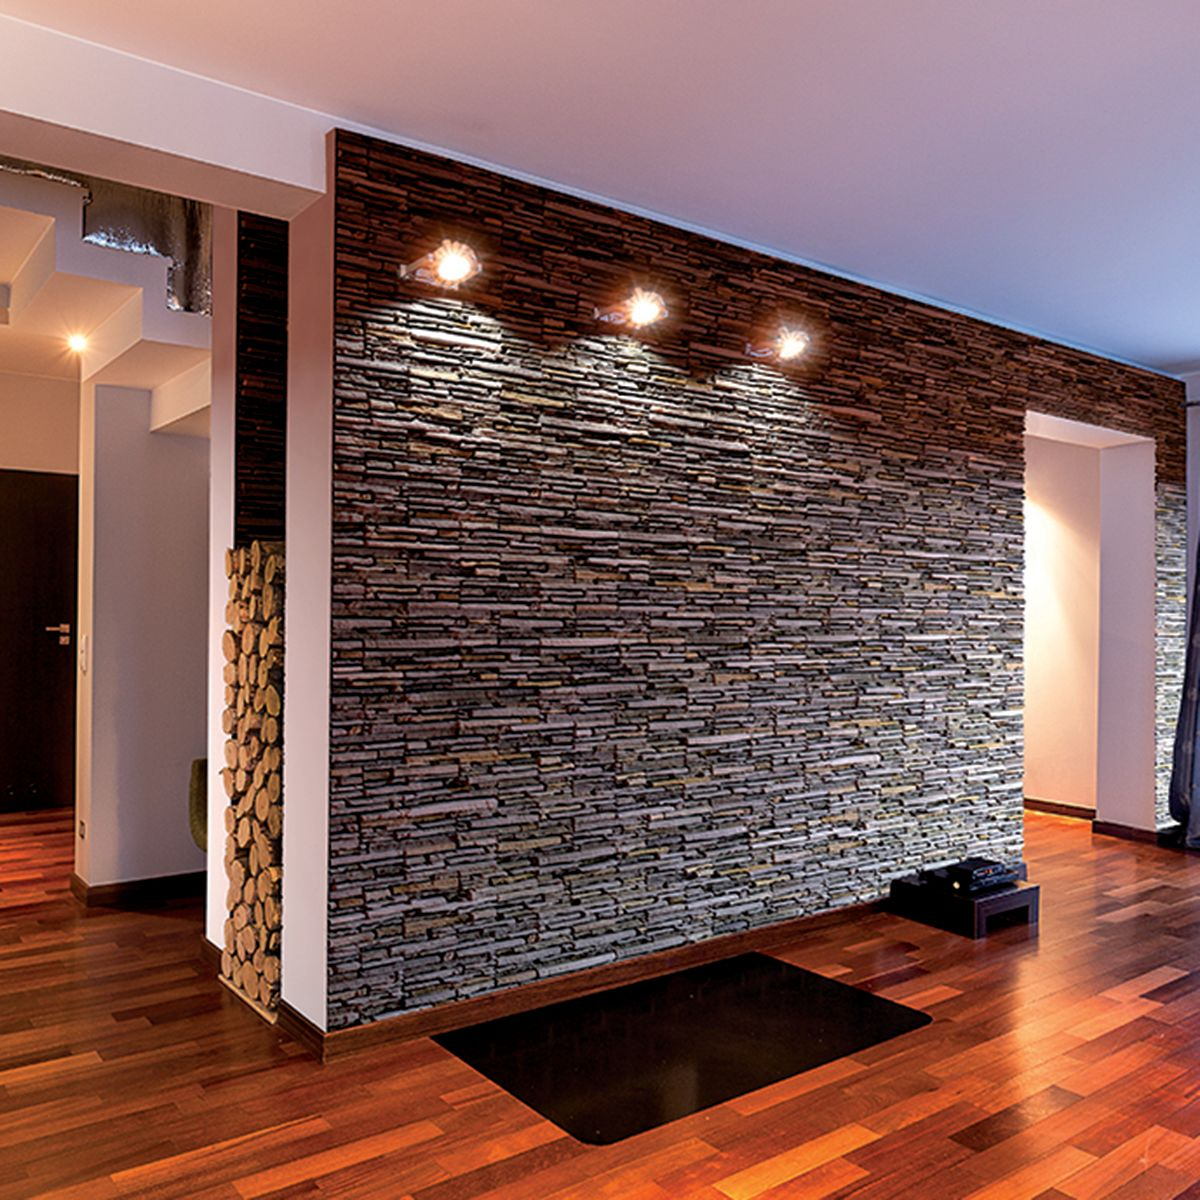 Rivestimento decorativo leroy merlin gw04 pineglen - Rivestimento decorativo pareti ...